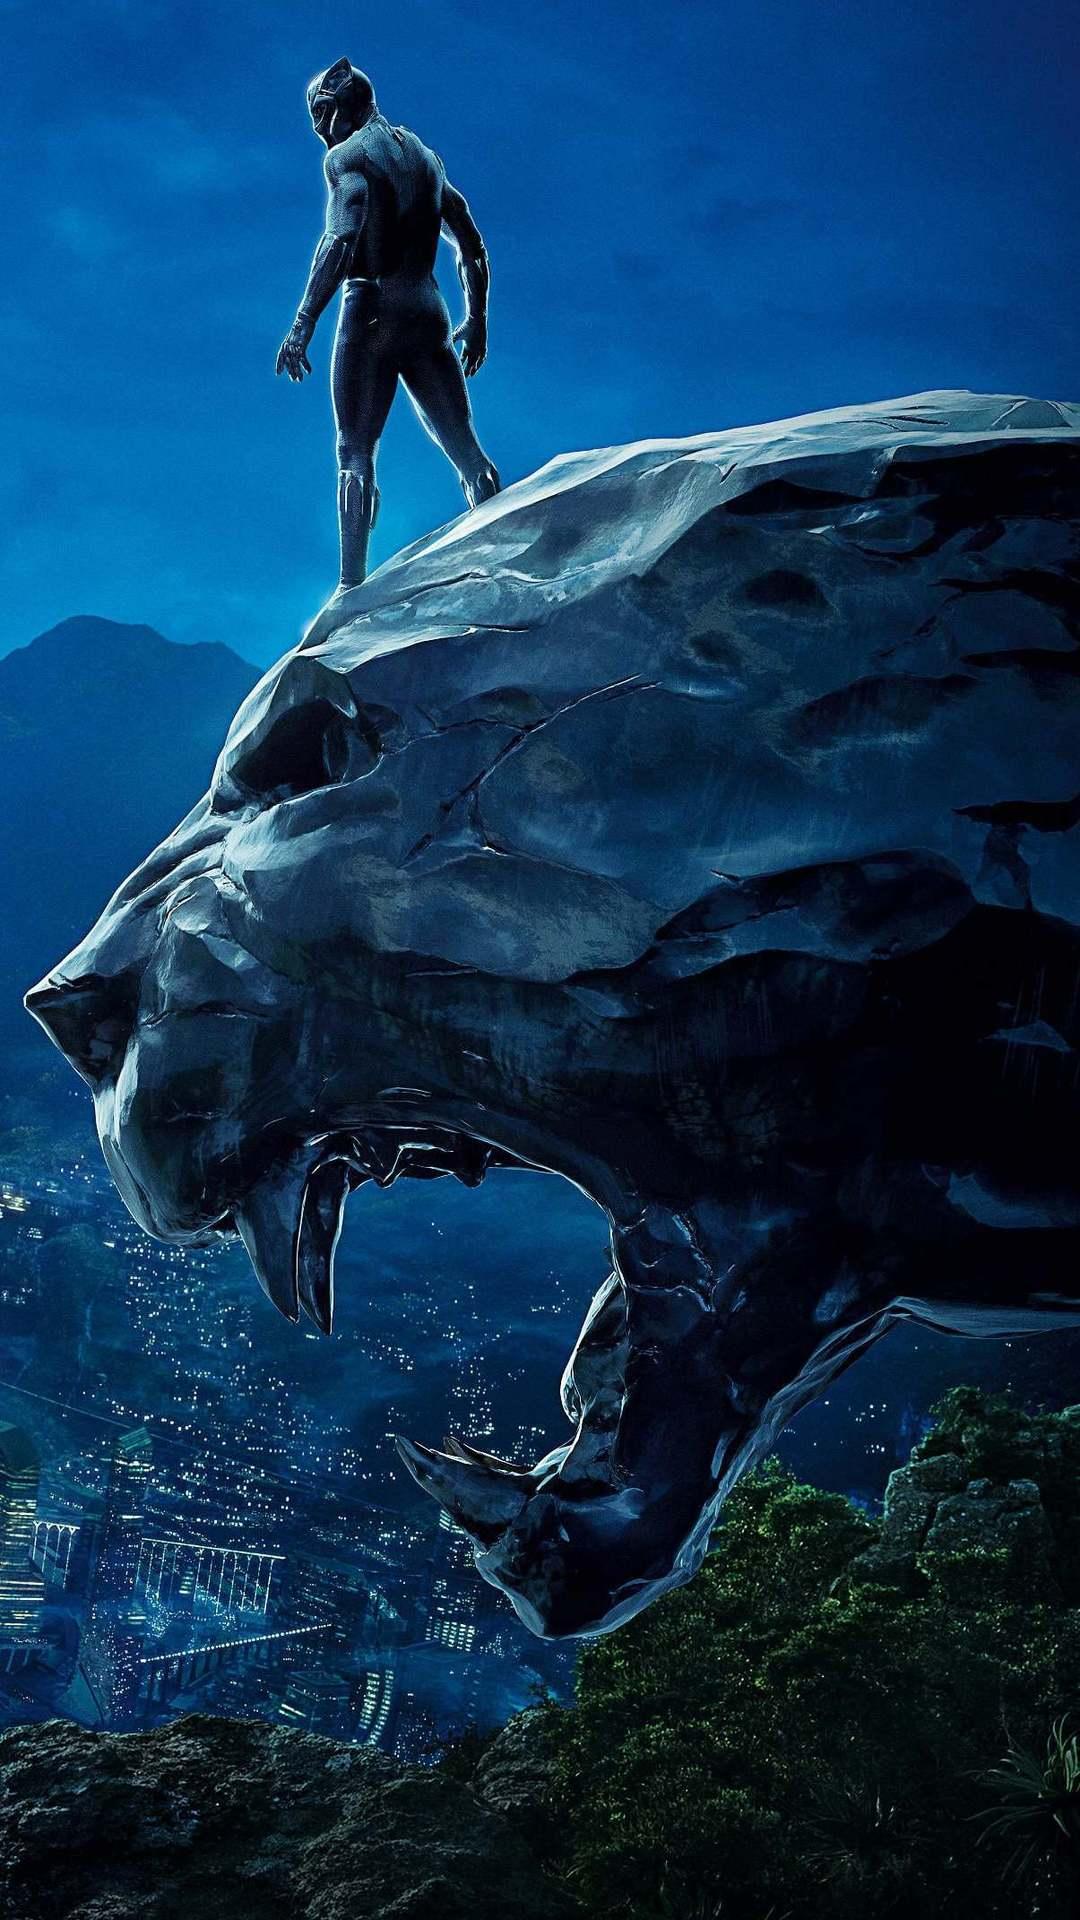 Black Panther Animal Iphone Wallpapers Top Free Black